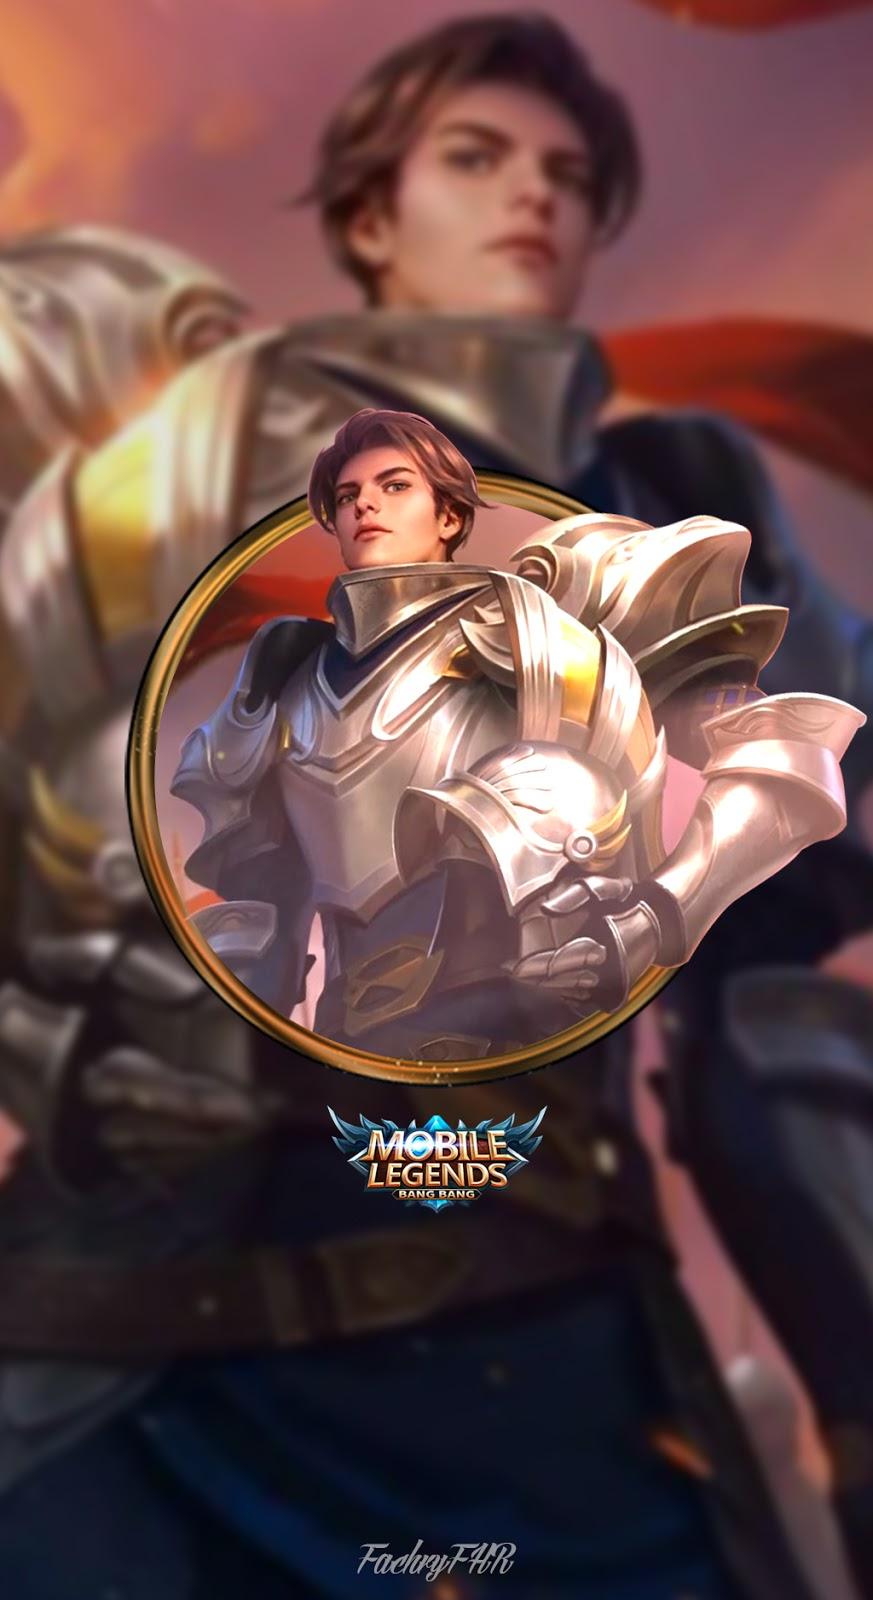 Wallpaper Mobile Legends Zilong Shining Knight By